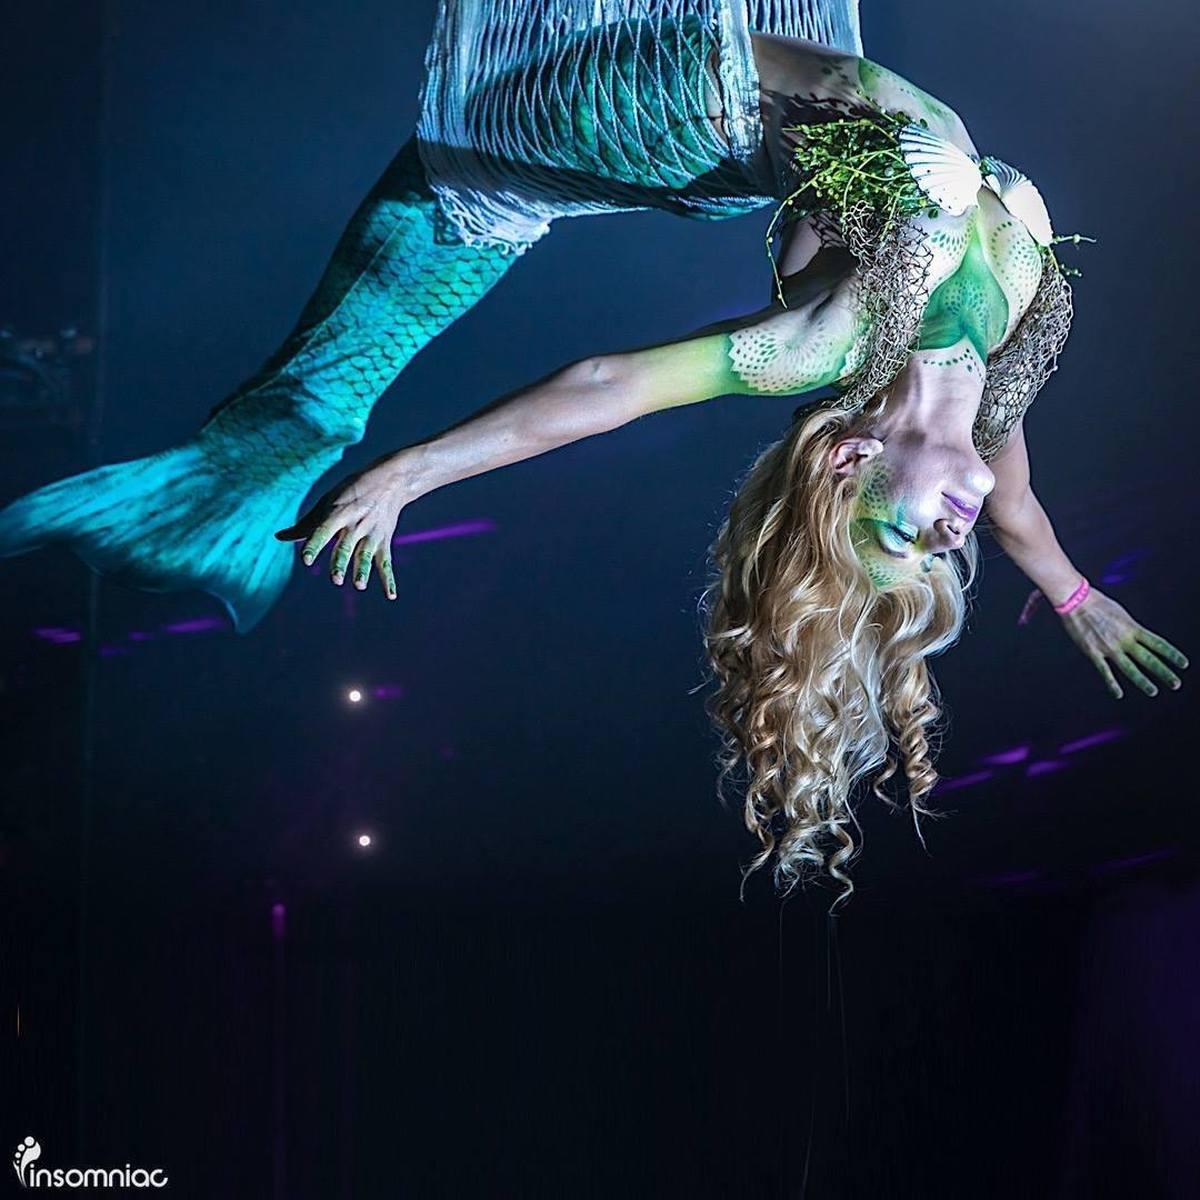 Mermaid In a Net